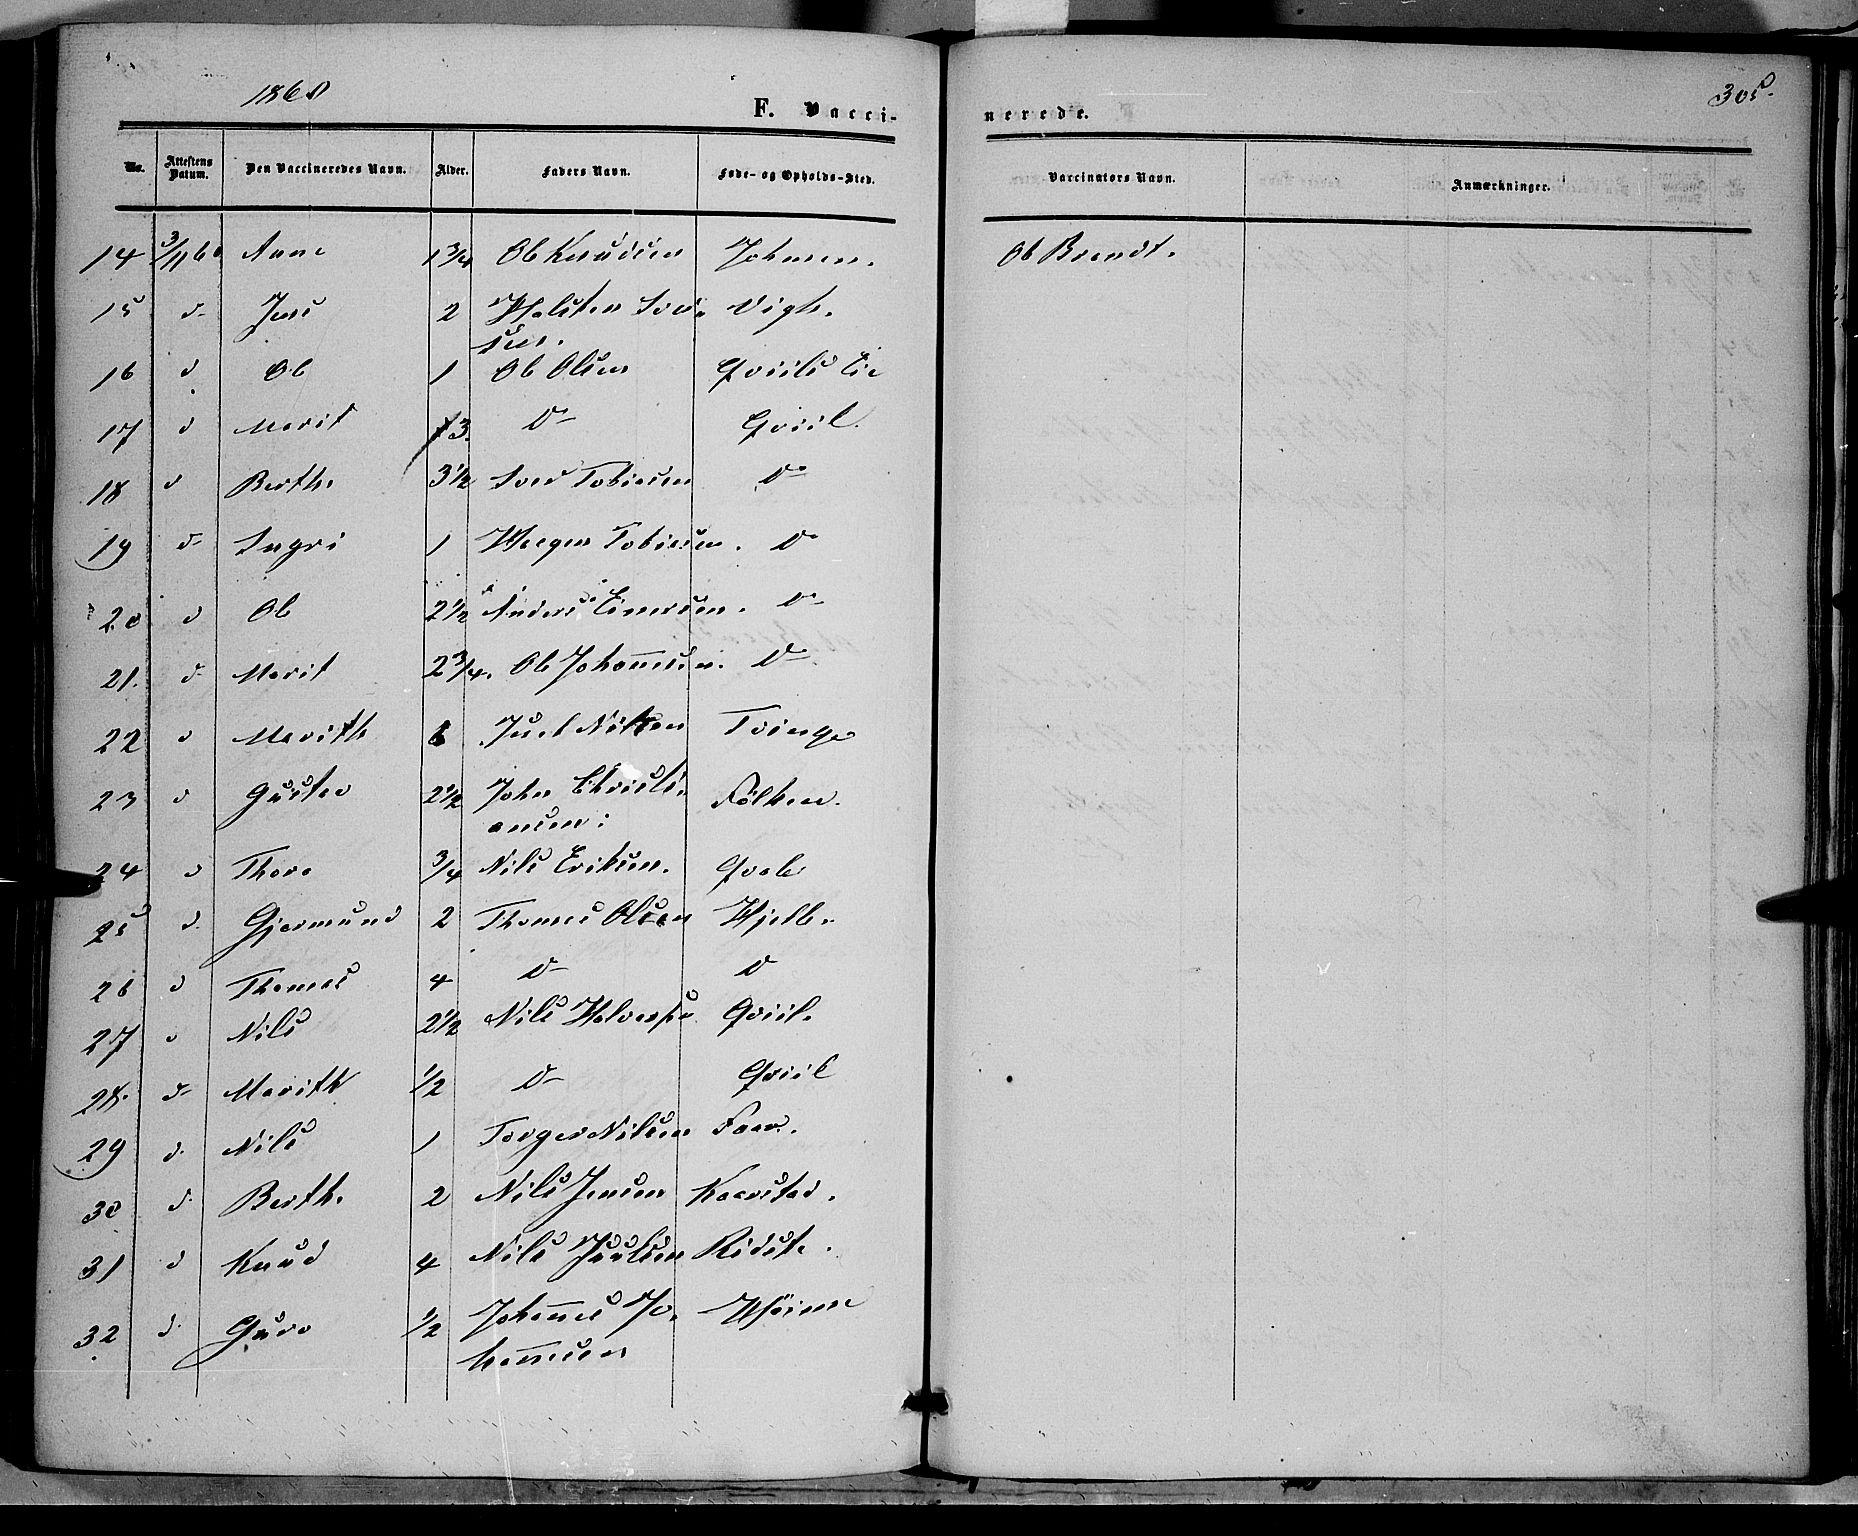 SAH, Vestre Slidre prestekontor, Ministerialbok nr. 2, 1856-1864, s. 305